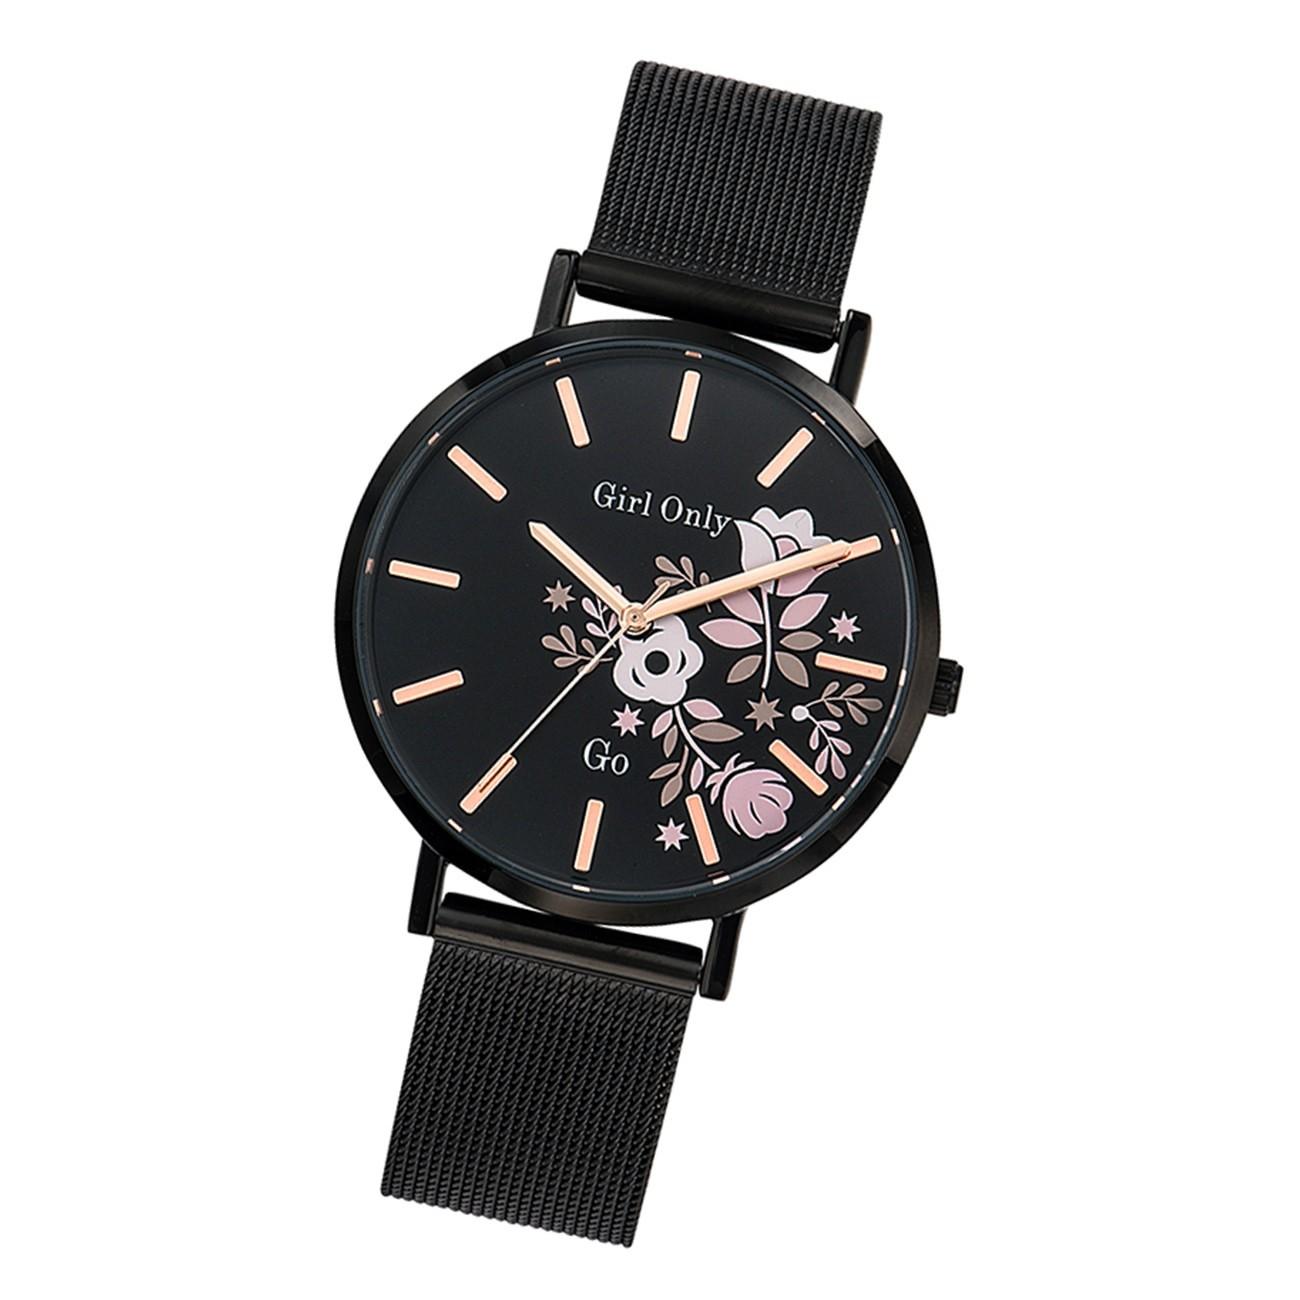 Girl Only Damen Armbanduhr GO 695912 Analog Uhr Edelstahl schwarz UGO695912